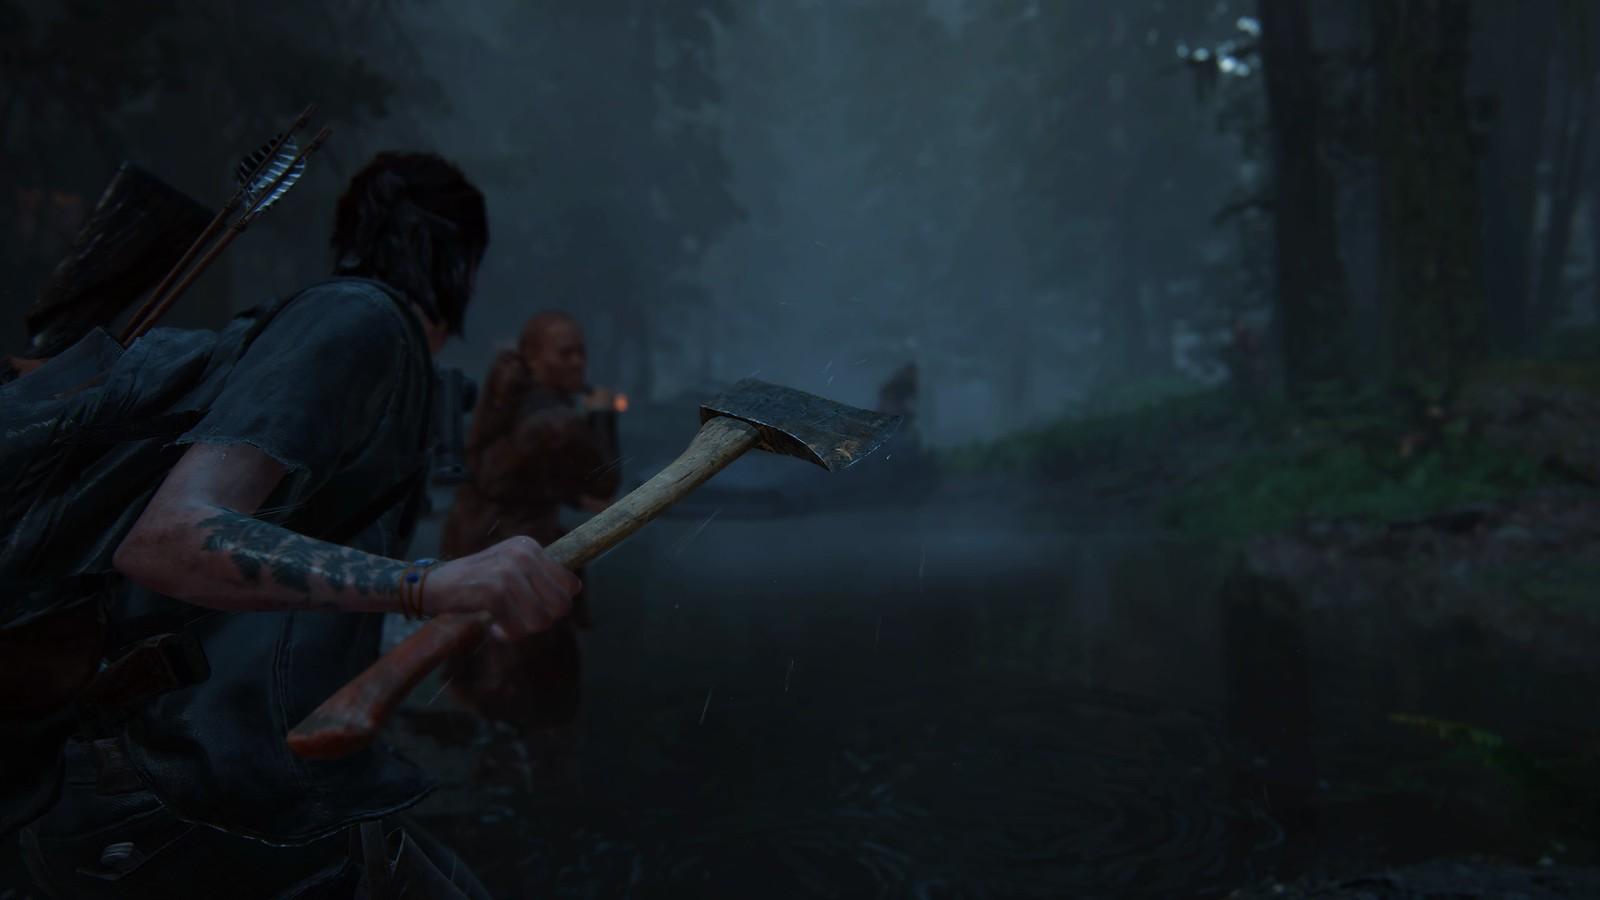 The Last of Us Part II_pic5 - Drew Wilson